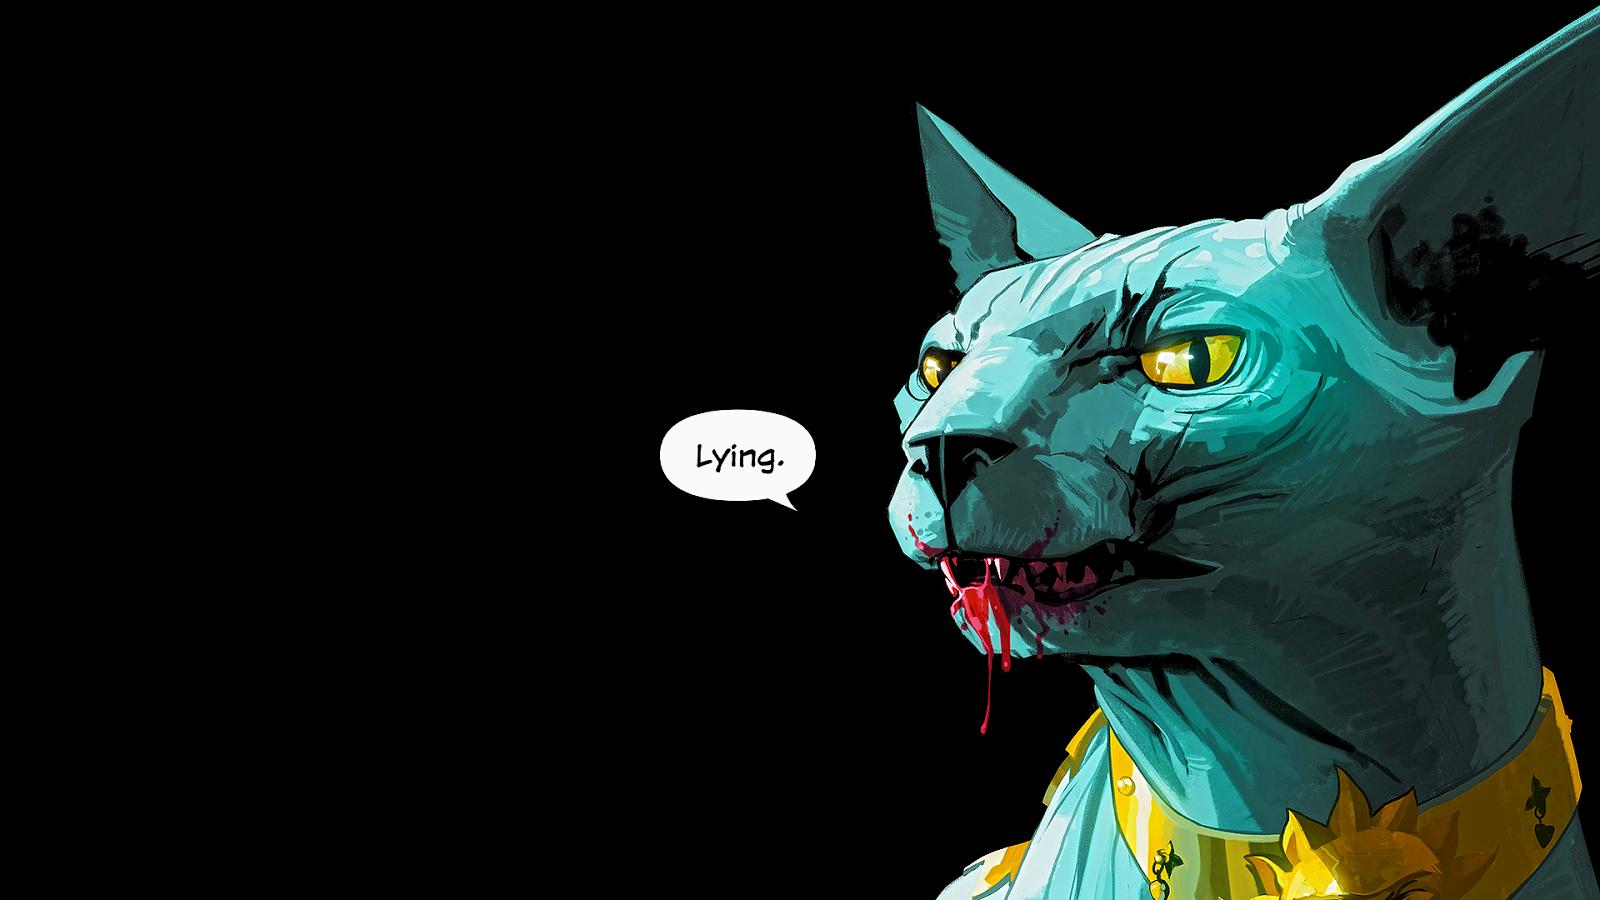 Lying Cat Saga Comic This Is Fine Dog Graphic Novel